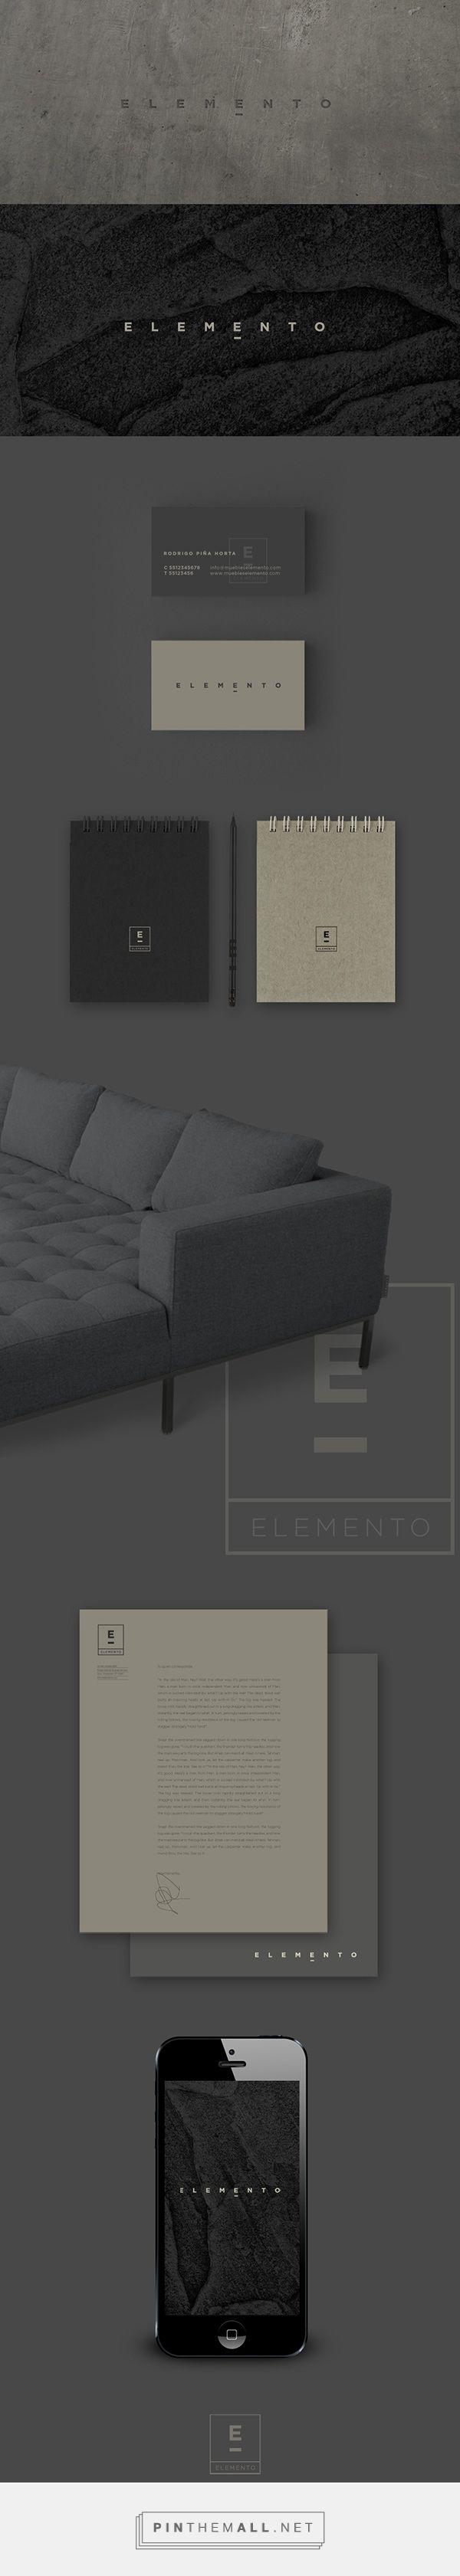 ELEMENTO Furniture Design Studio Branding by Alejandra Astiazarán   Fivestar Branding Agency – Design and Branding Agency & Curated Inspiration Gallery